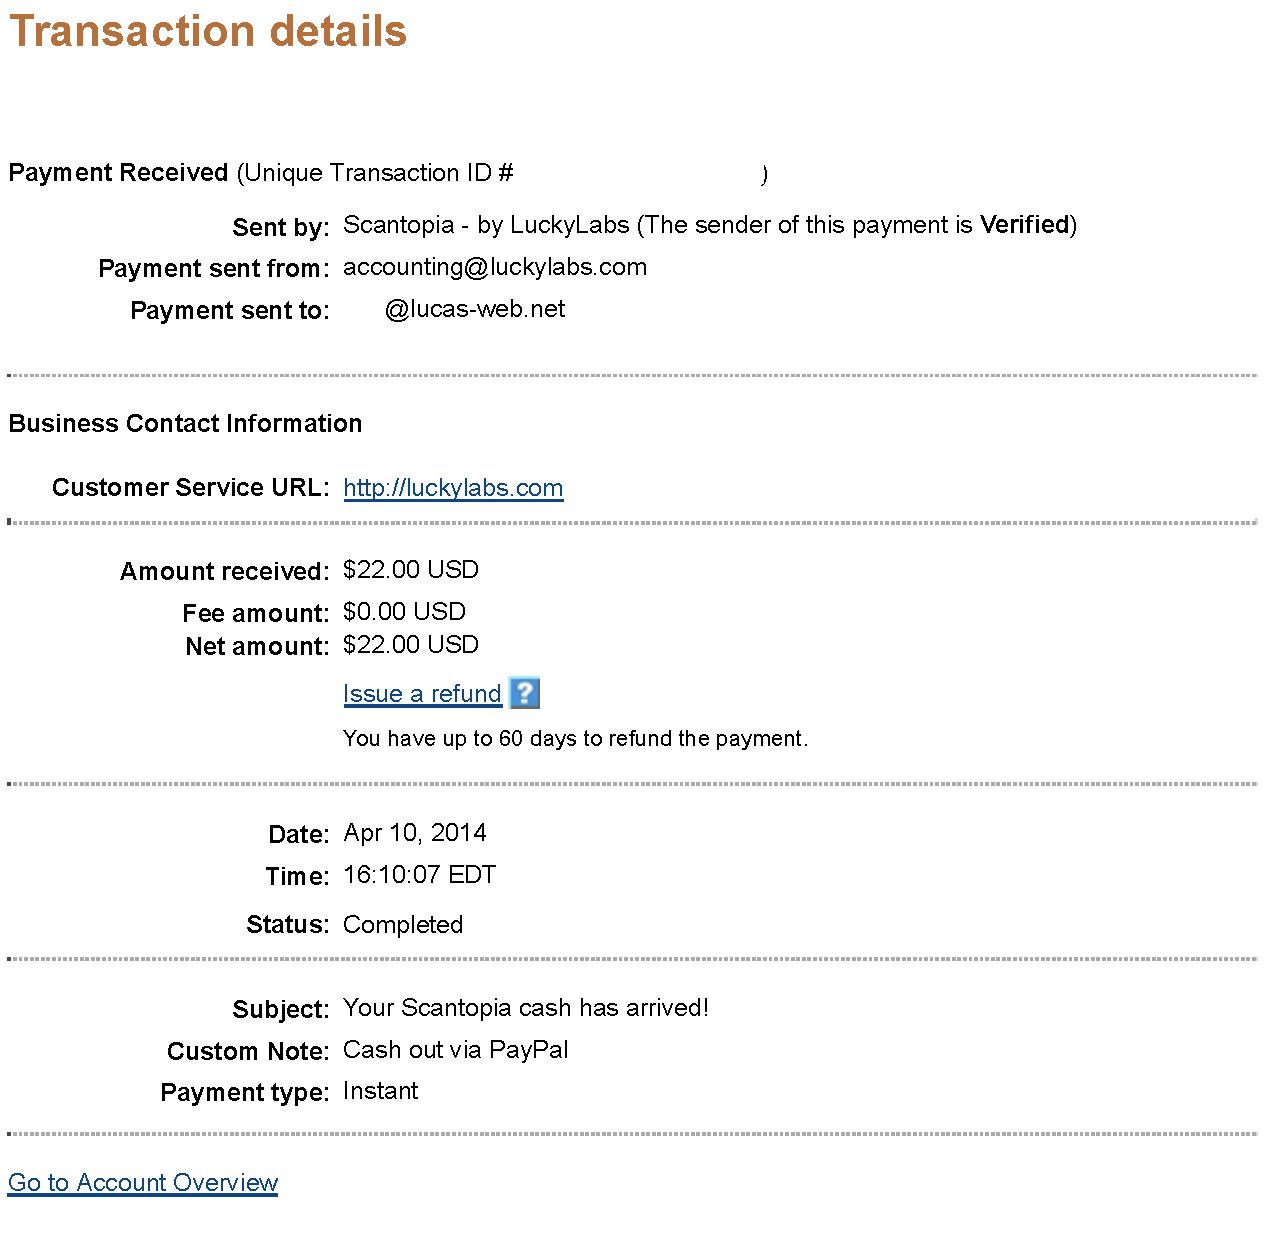 $22.00 - Scantopia - April 10, 2014